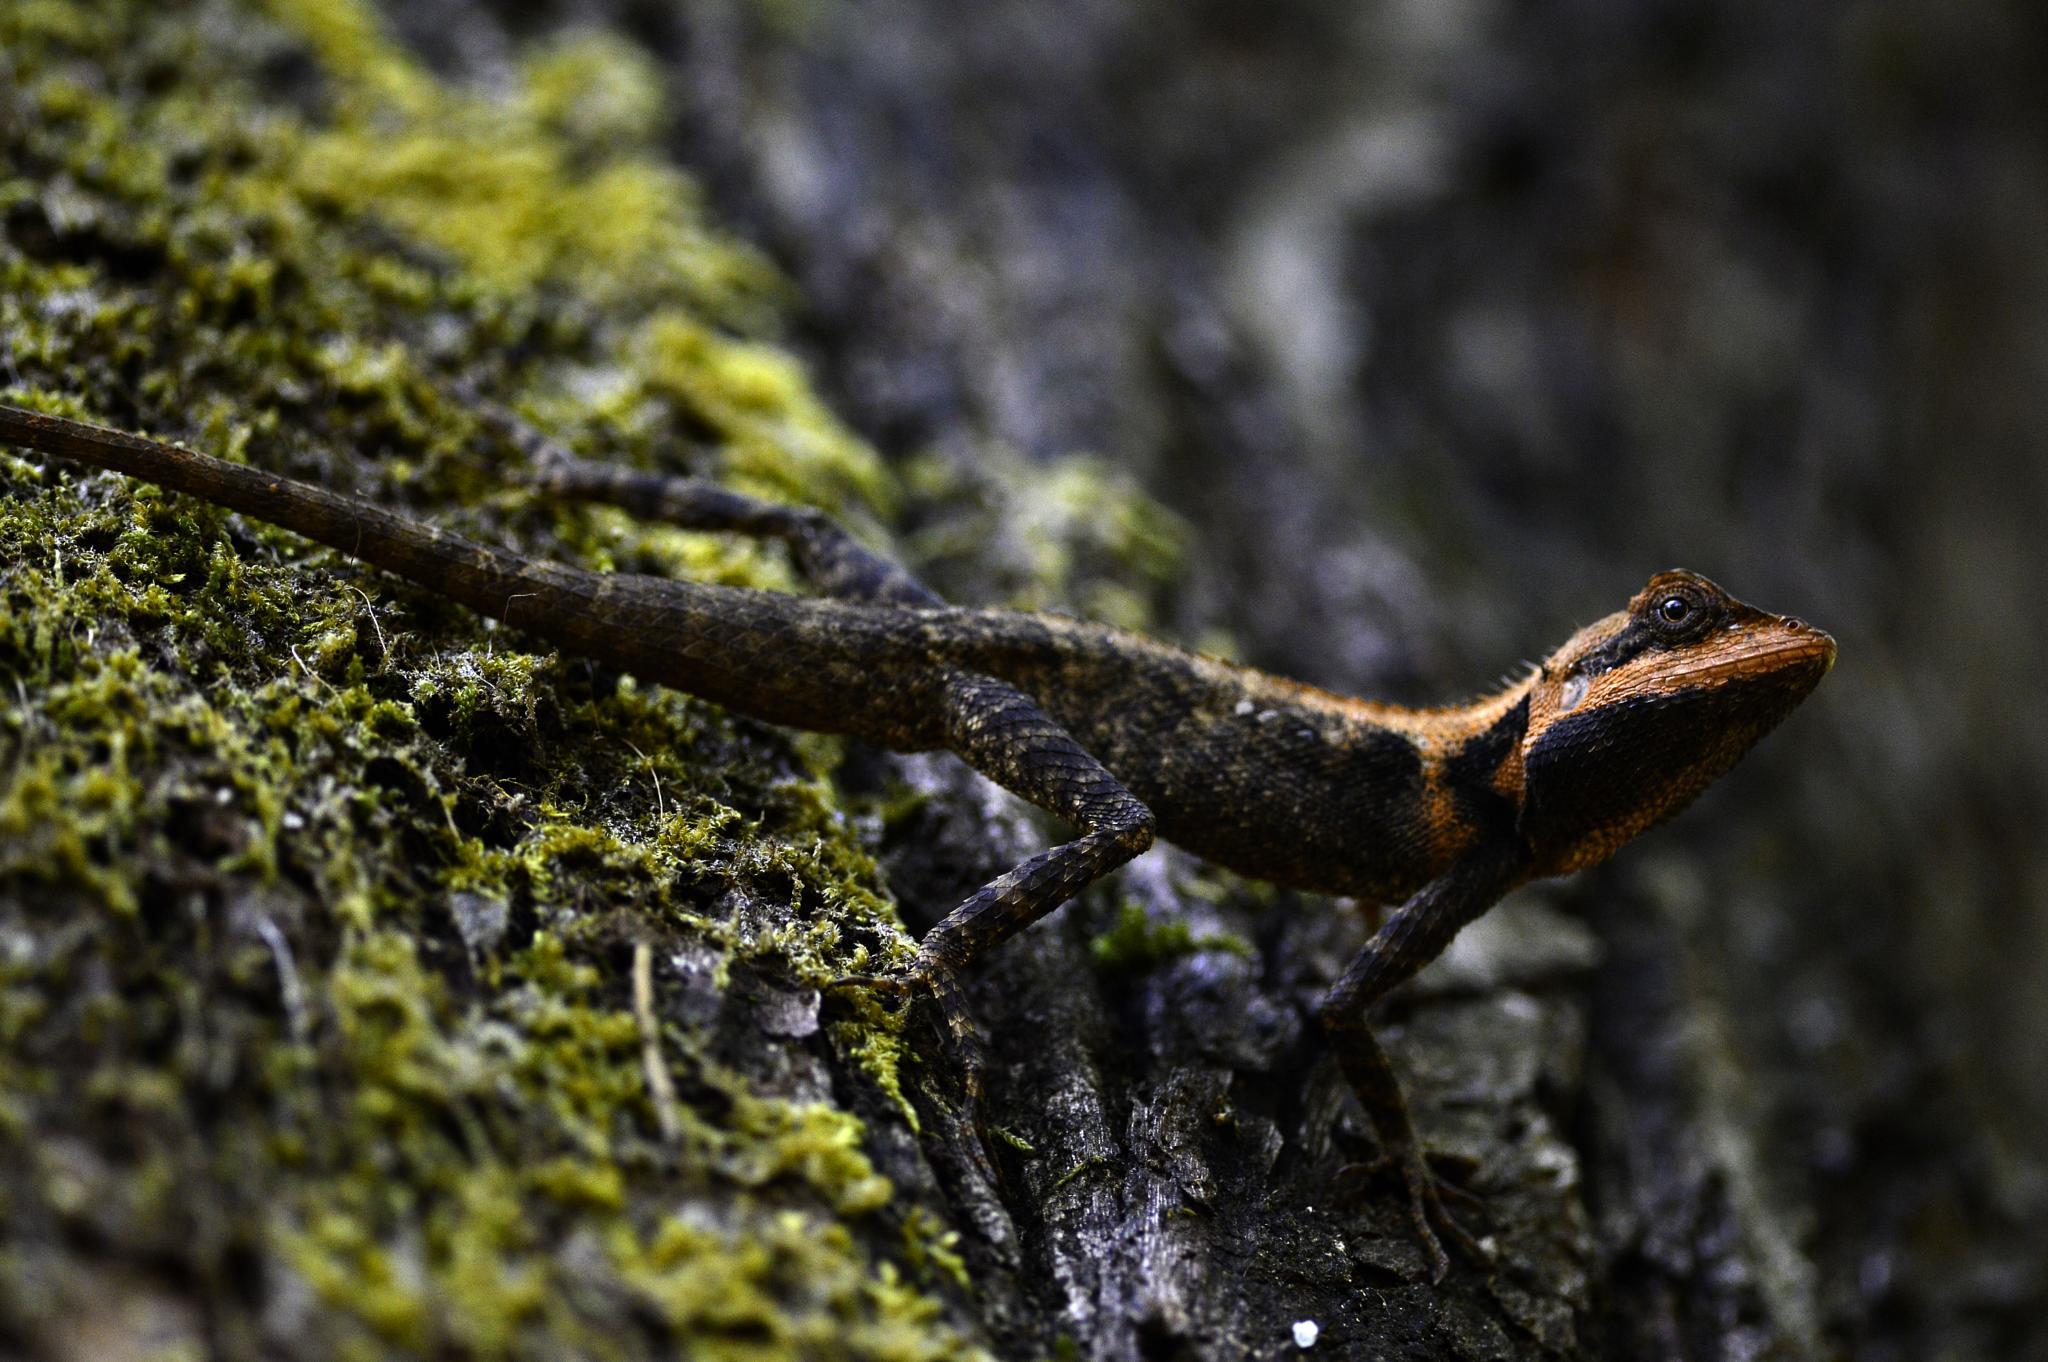 lizard by vasi23